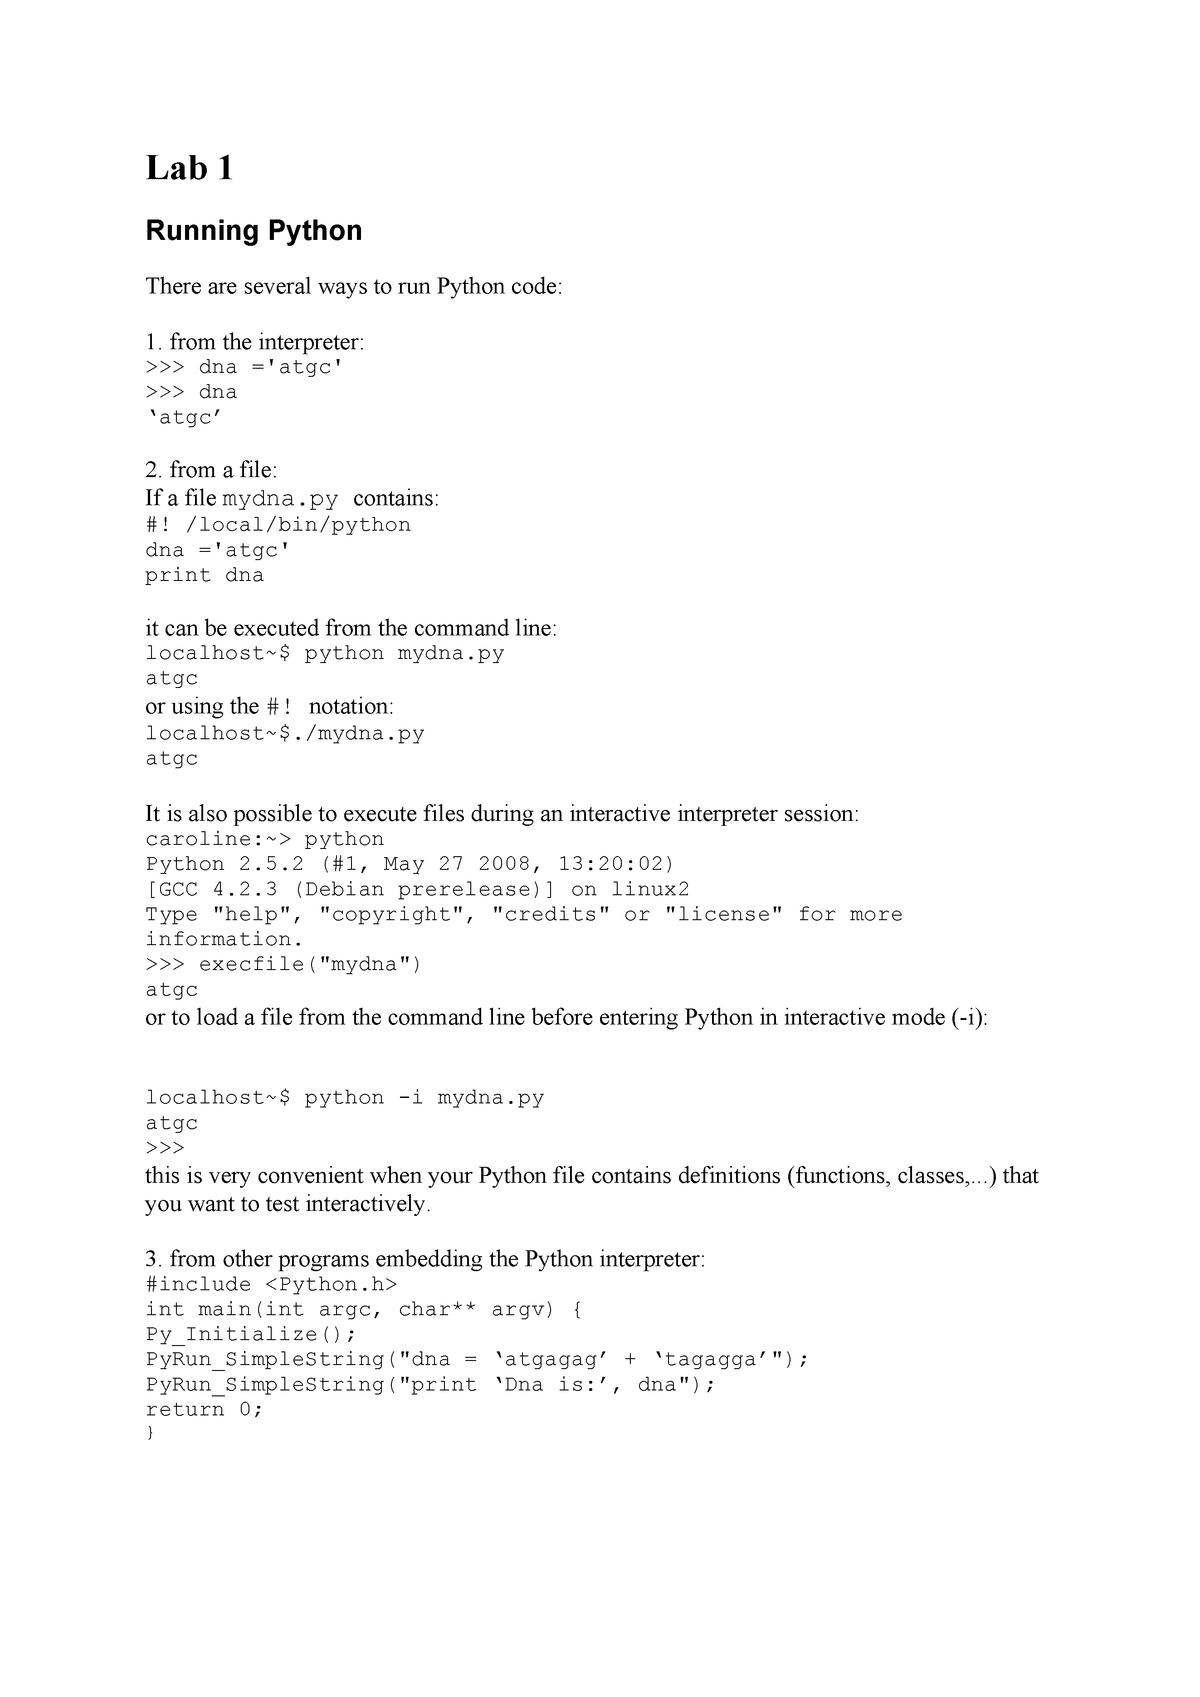 216645 Lab1 student - HPB3011: Bioinformatics Algorithms II